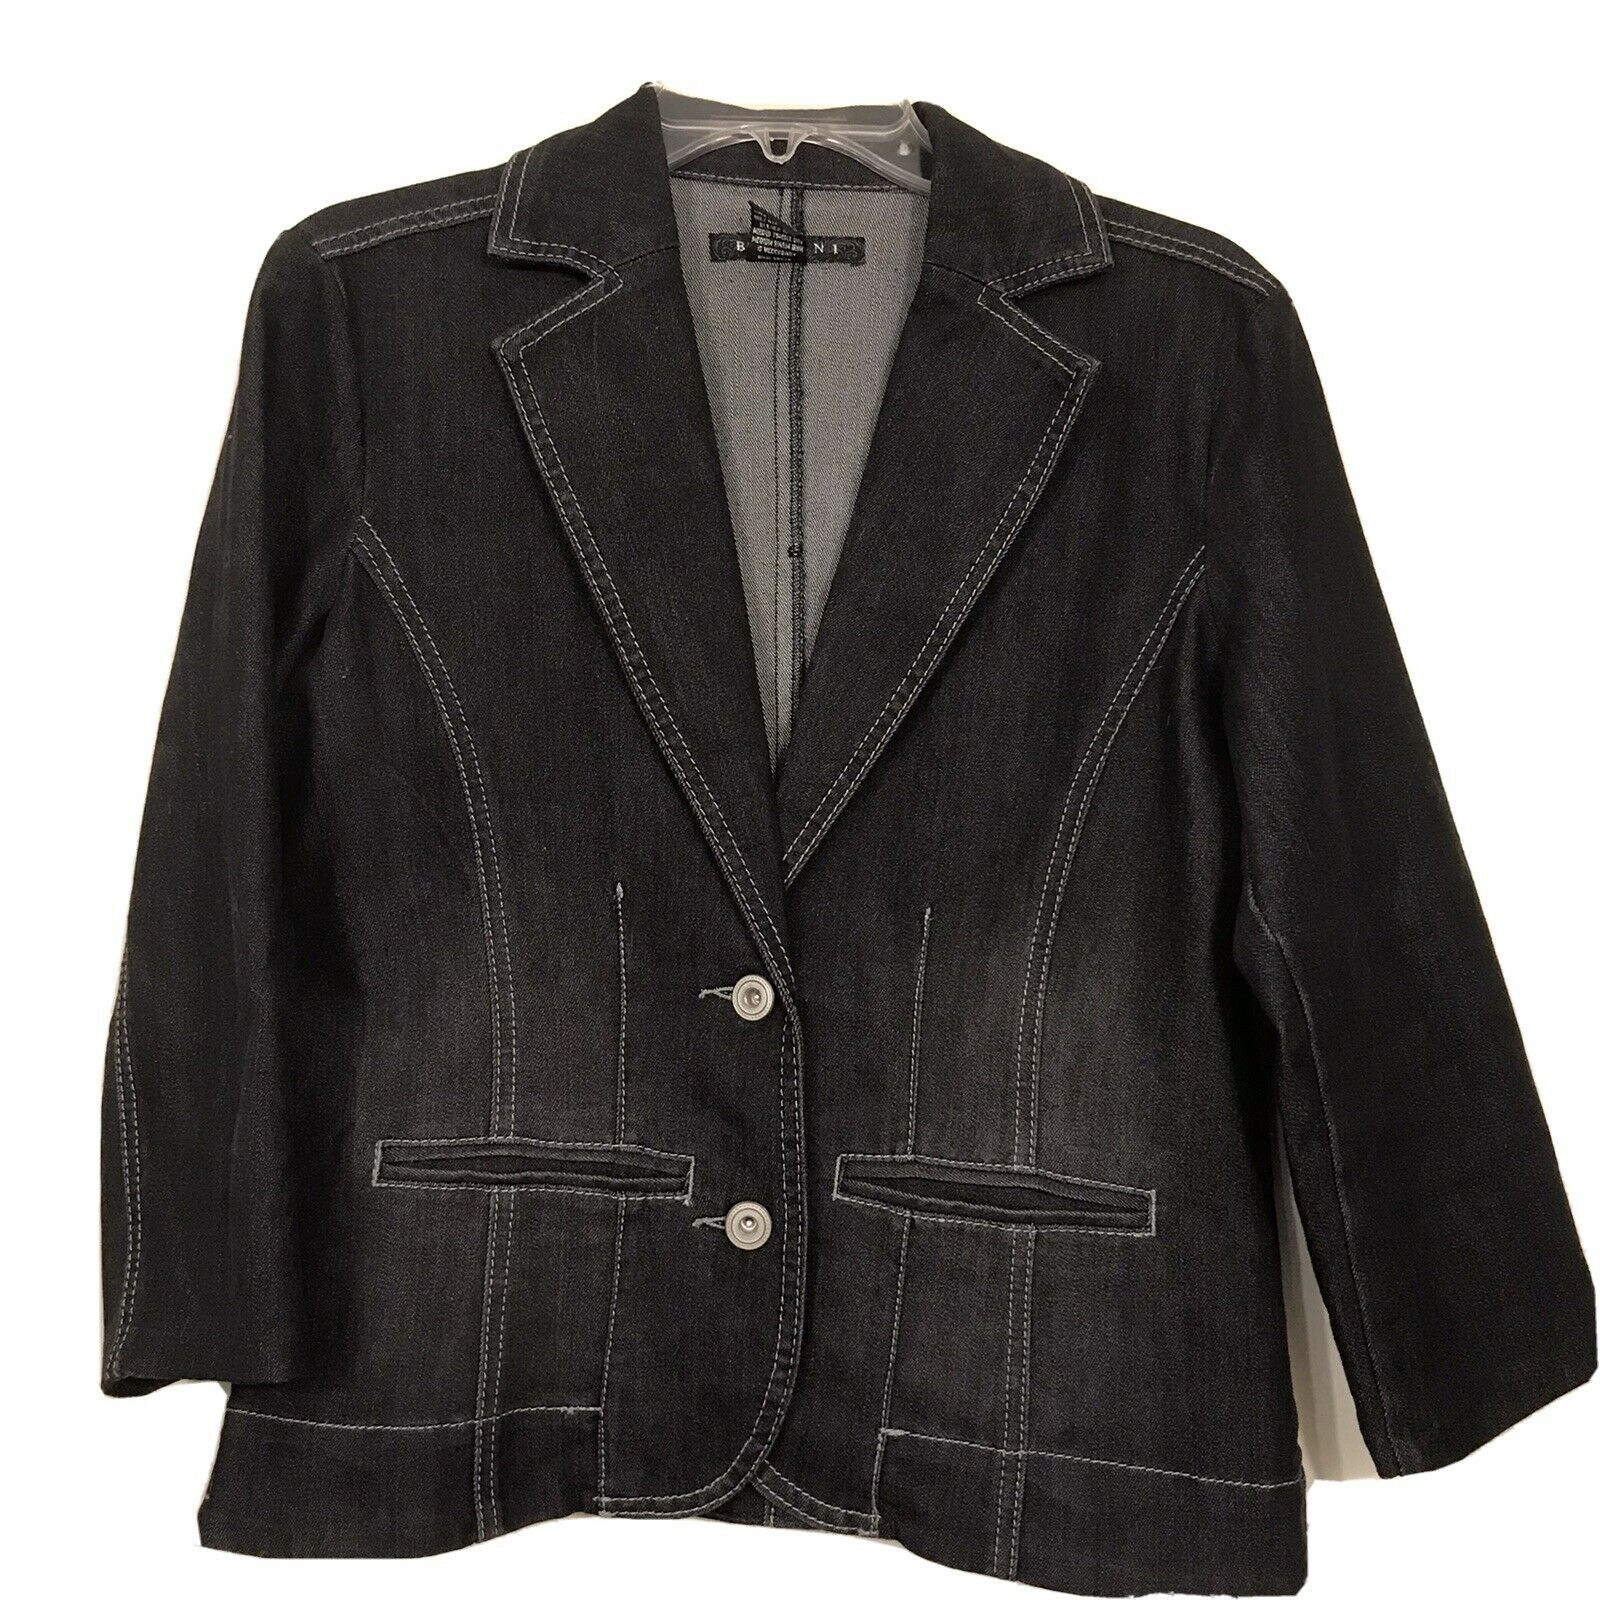 Baccini Women's Black Denim Career Casual Jacket 3/4 Sleeve Cropped Sz M EUC